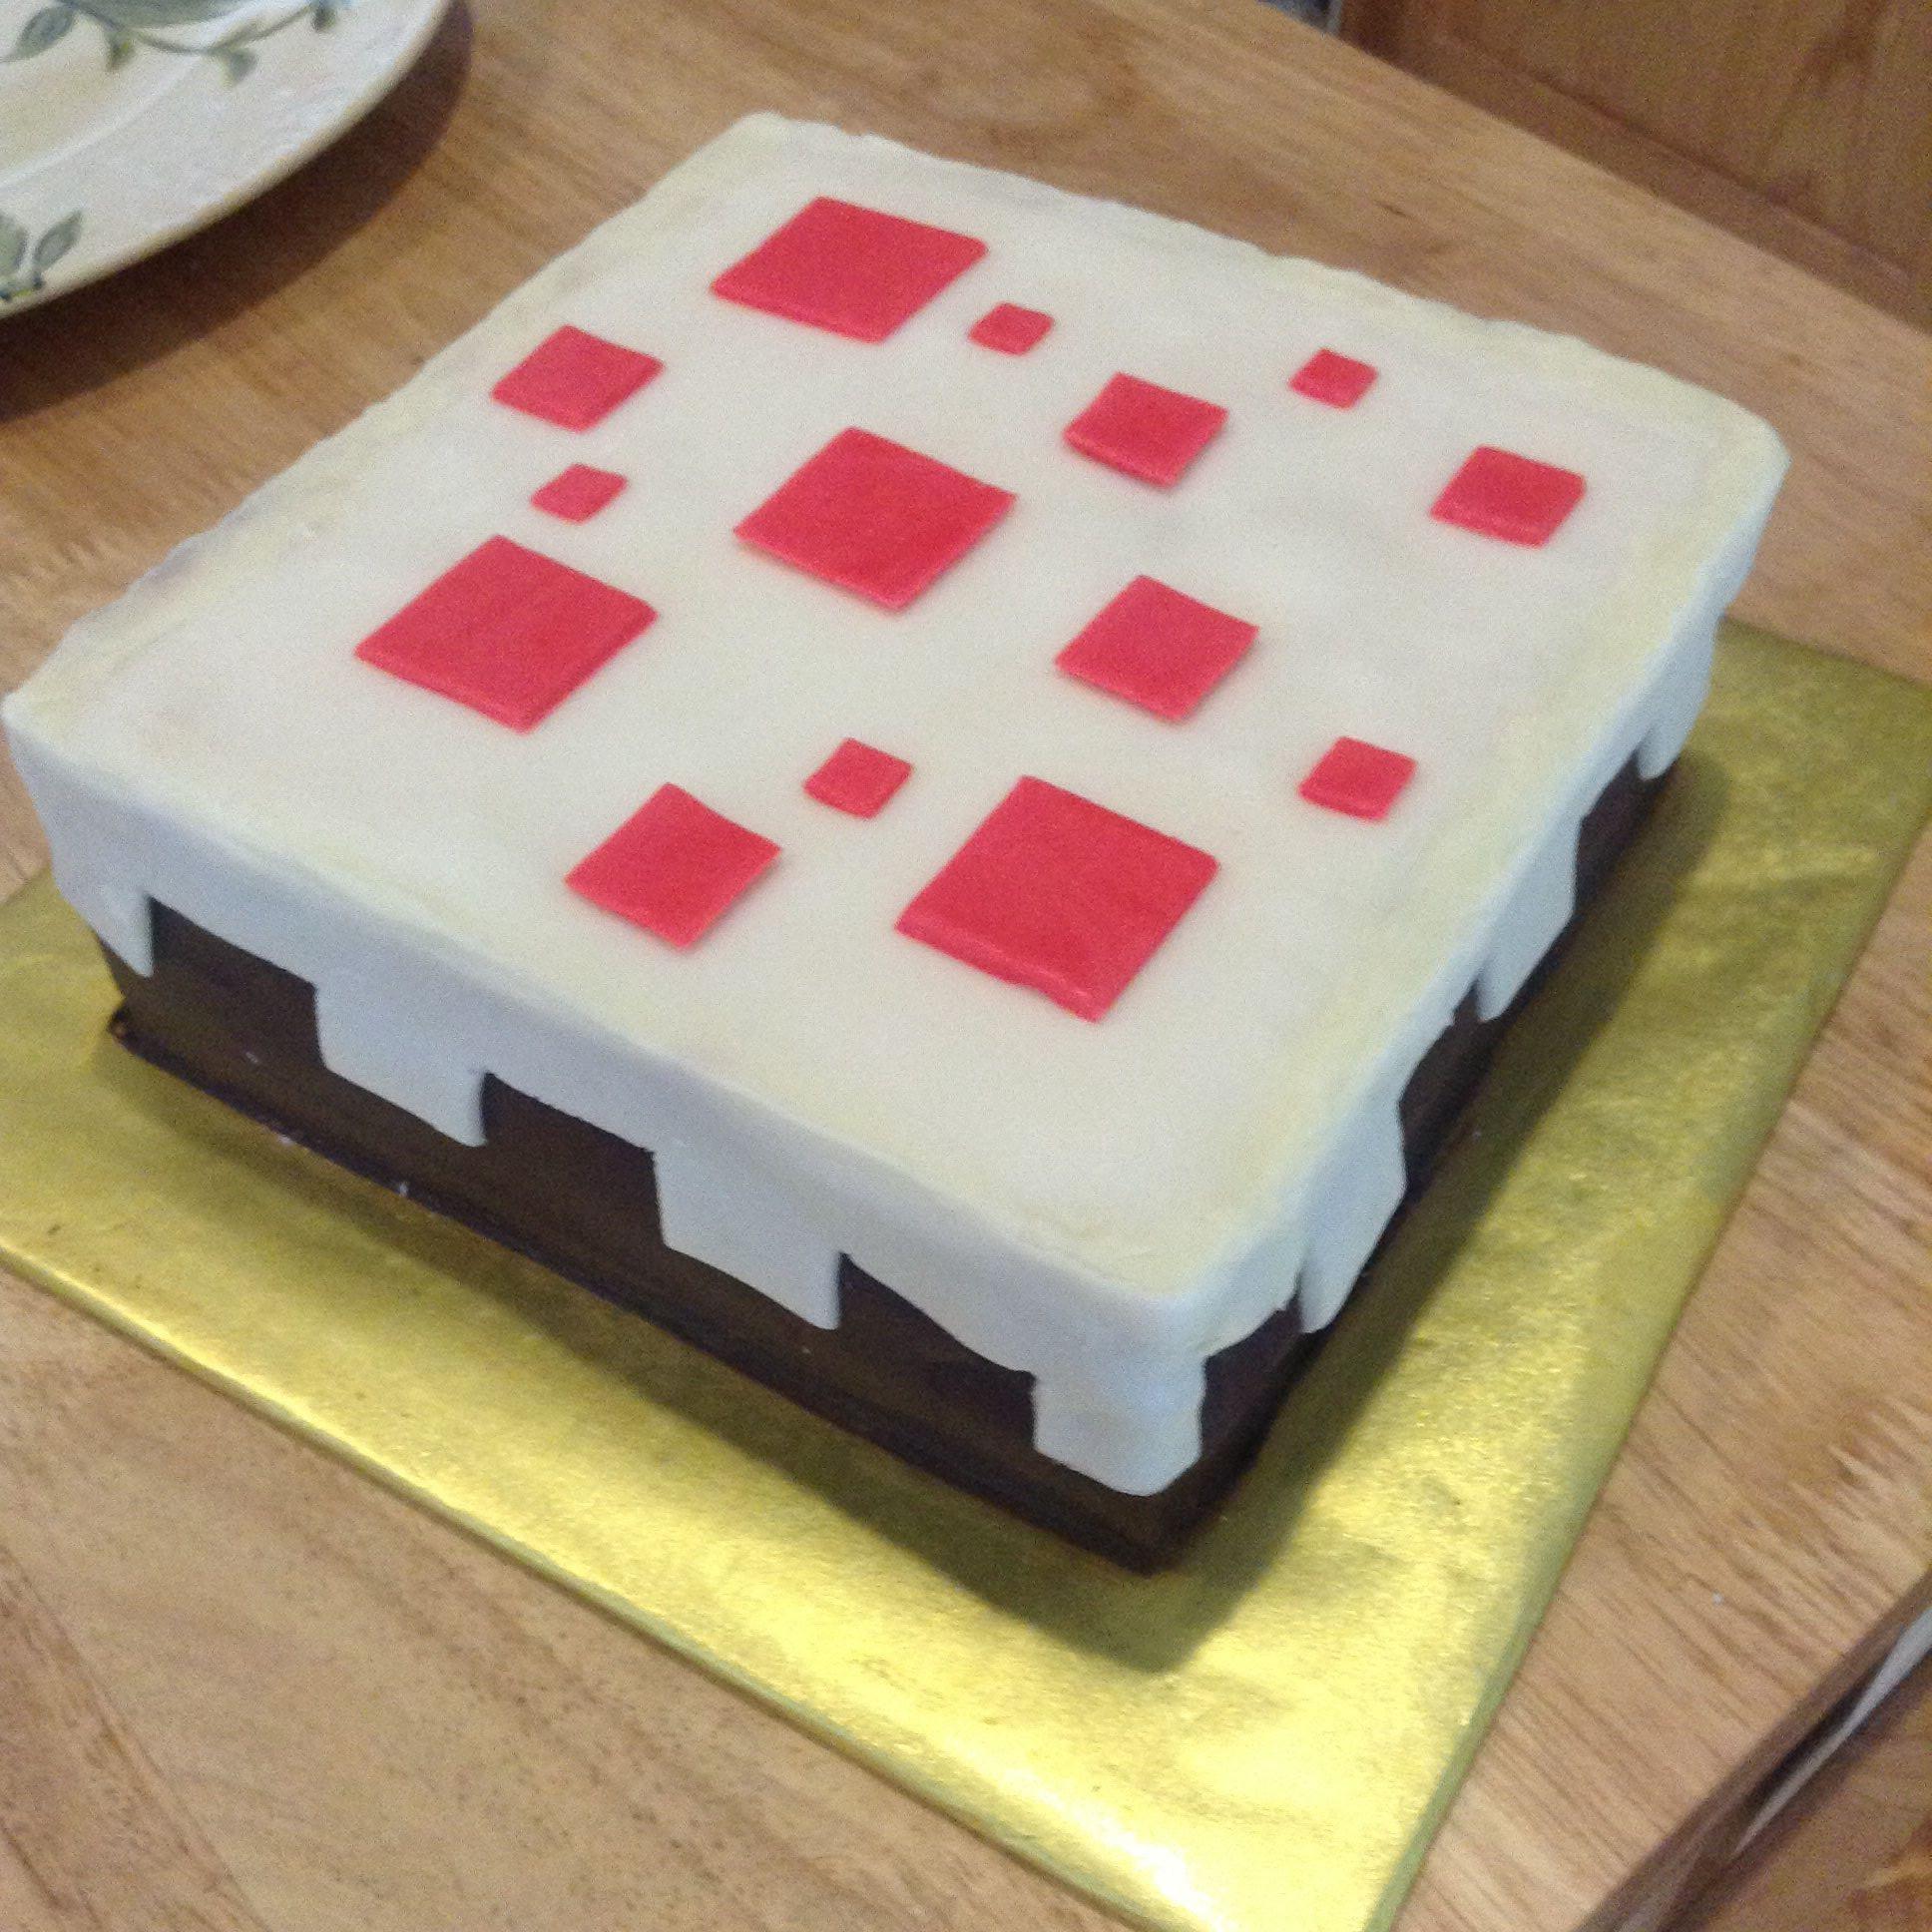 Cake Recipe Minecraft  Minecraft cake recipe All recipes UK